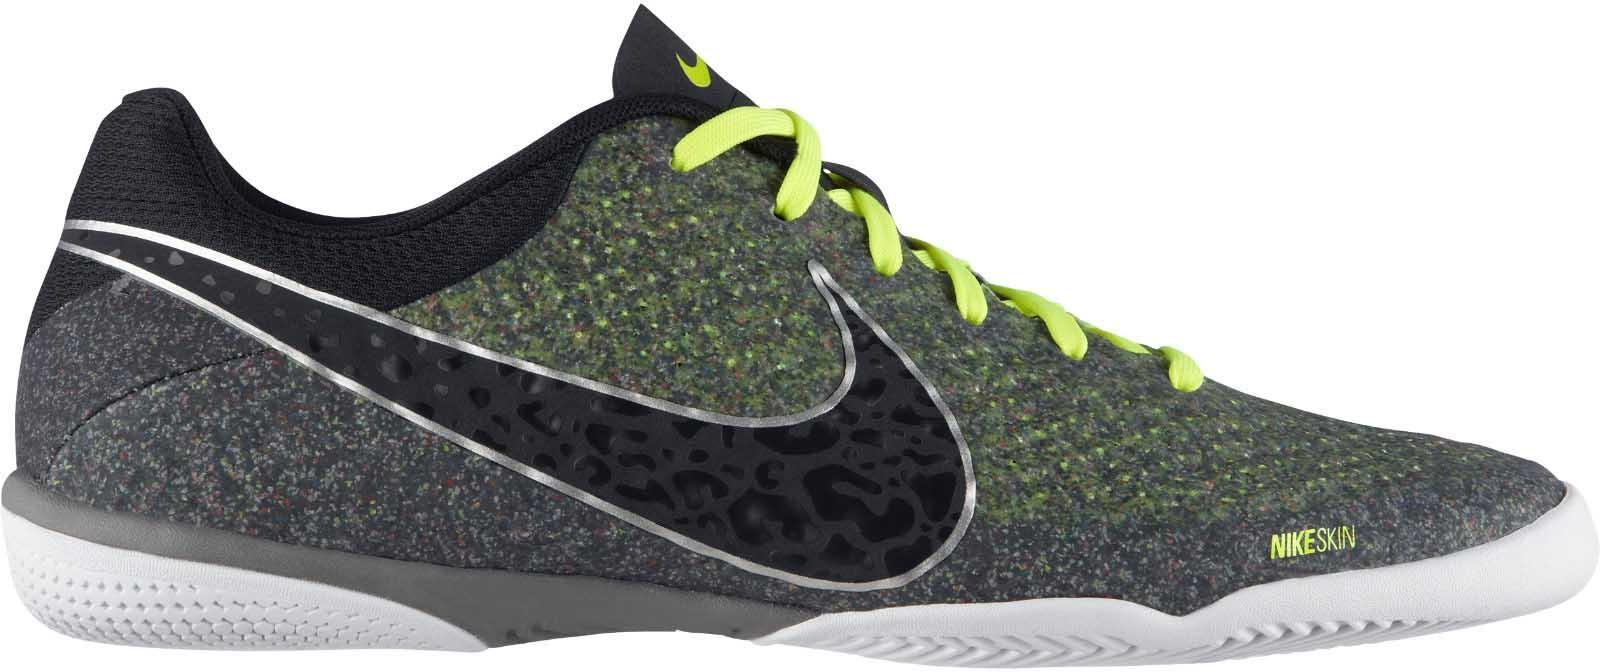 Nike Elastico Finale 2 Black - Musée des impressionnismes Giverny 60162dde315fb